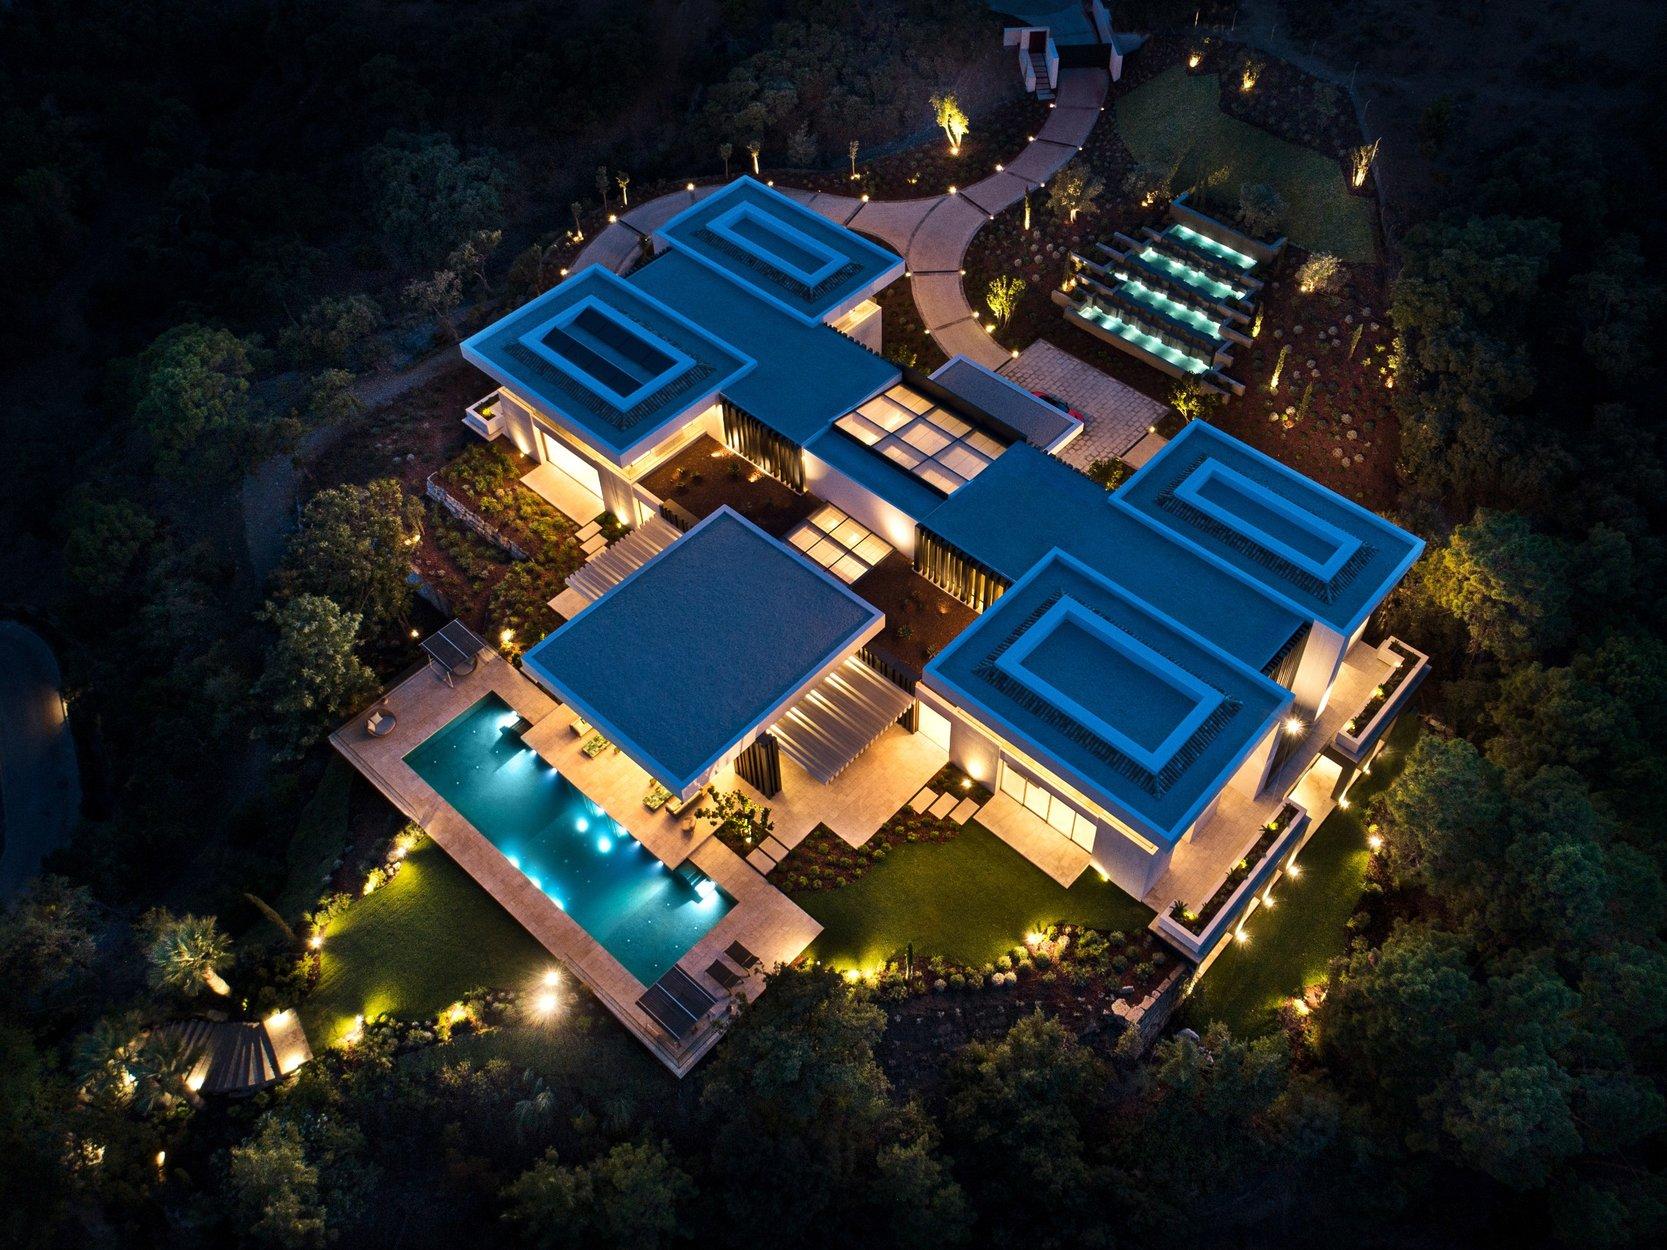 10 Bedroom 14 Bathroom Villa For Sale In La Zagaleta Benahavis Mas Property Marbella